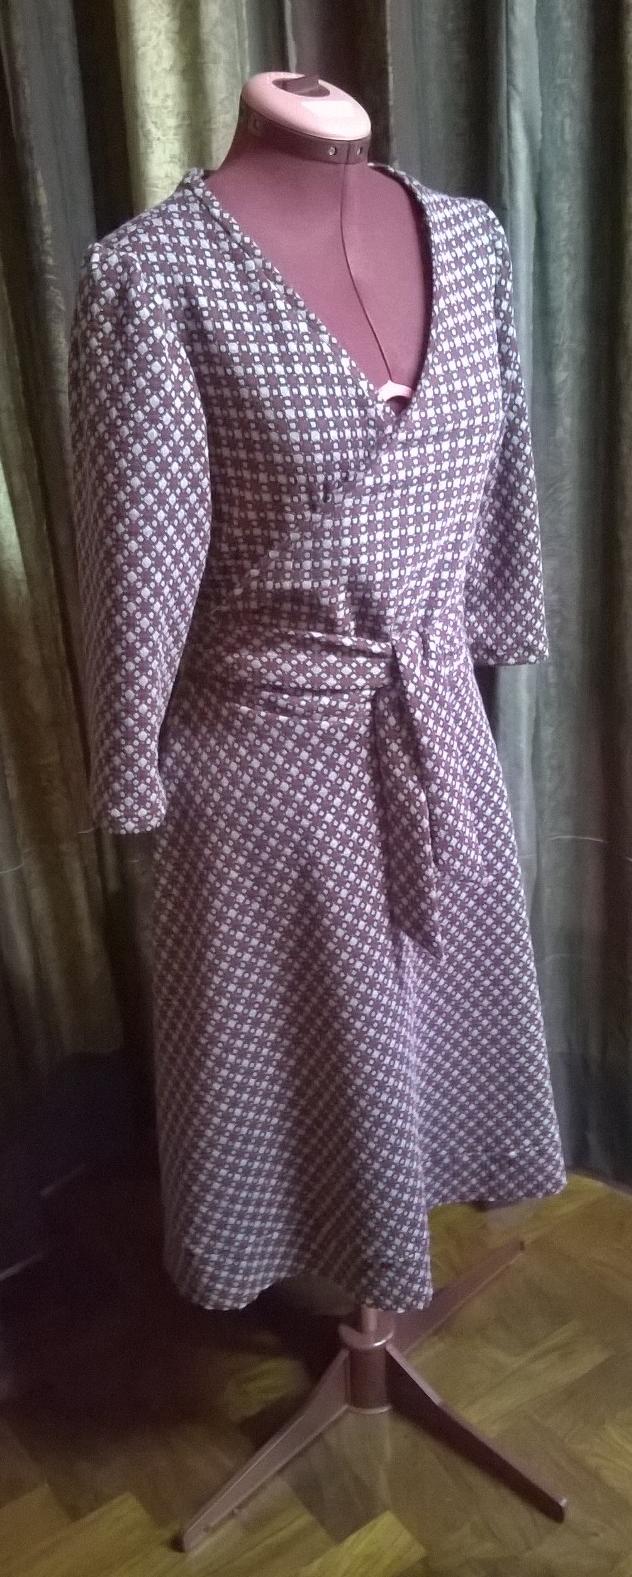 Colleen's dress